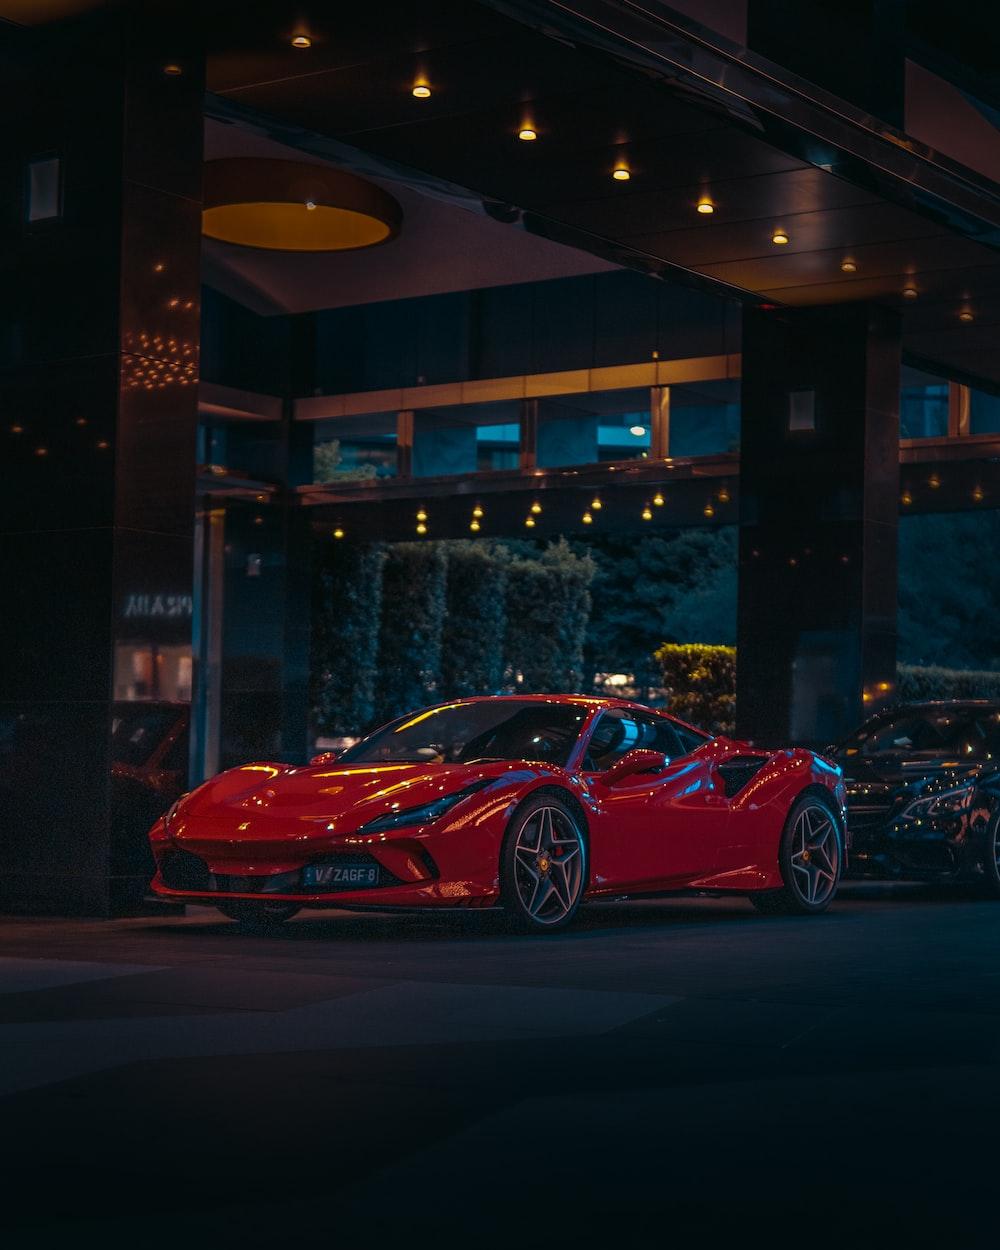 red ferrari 458 italia parked near building